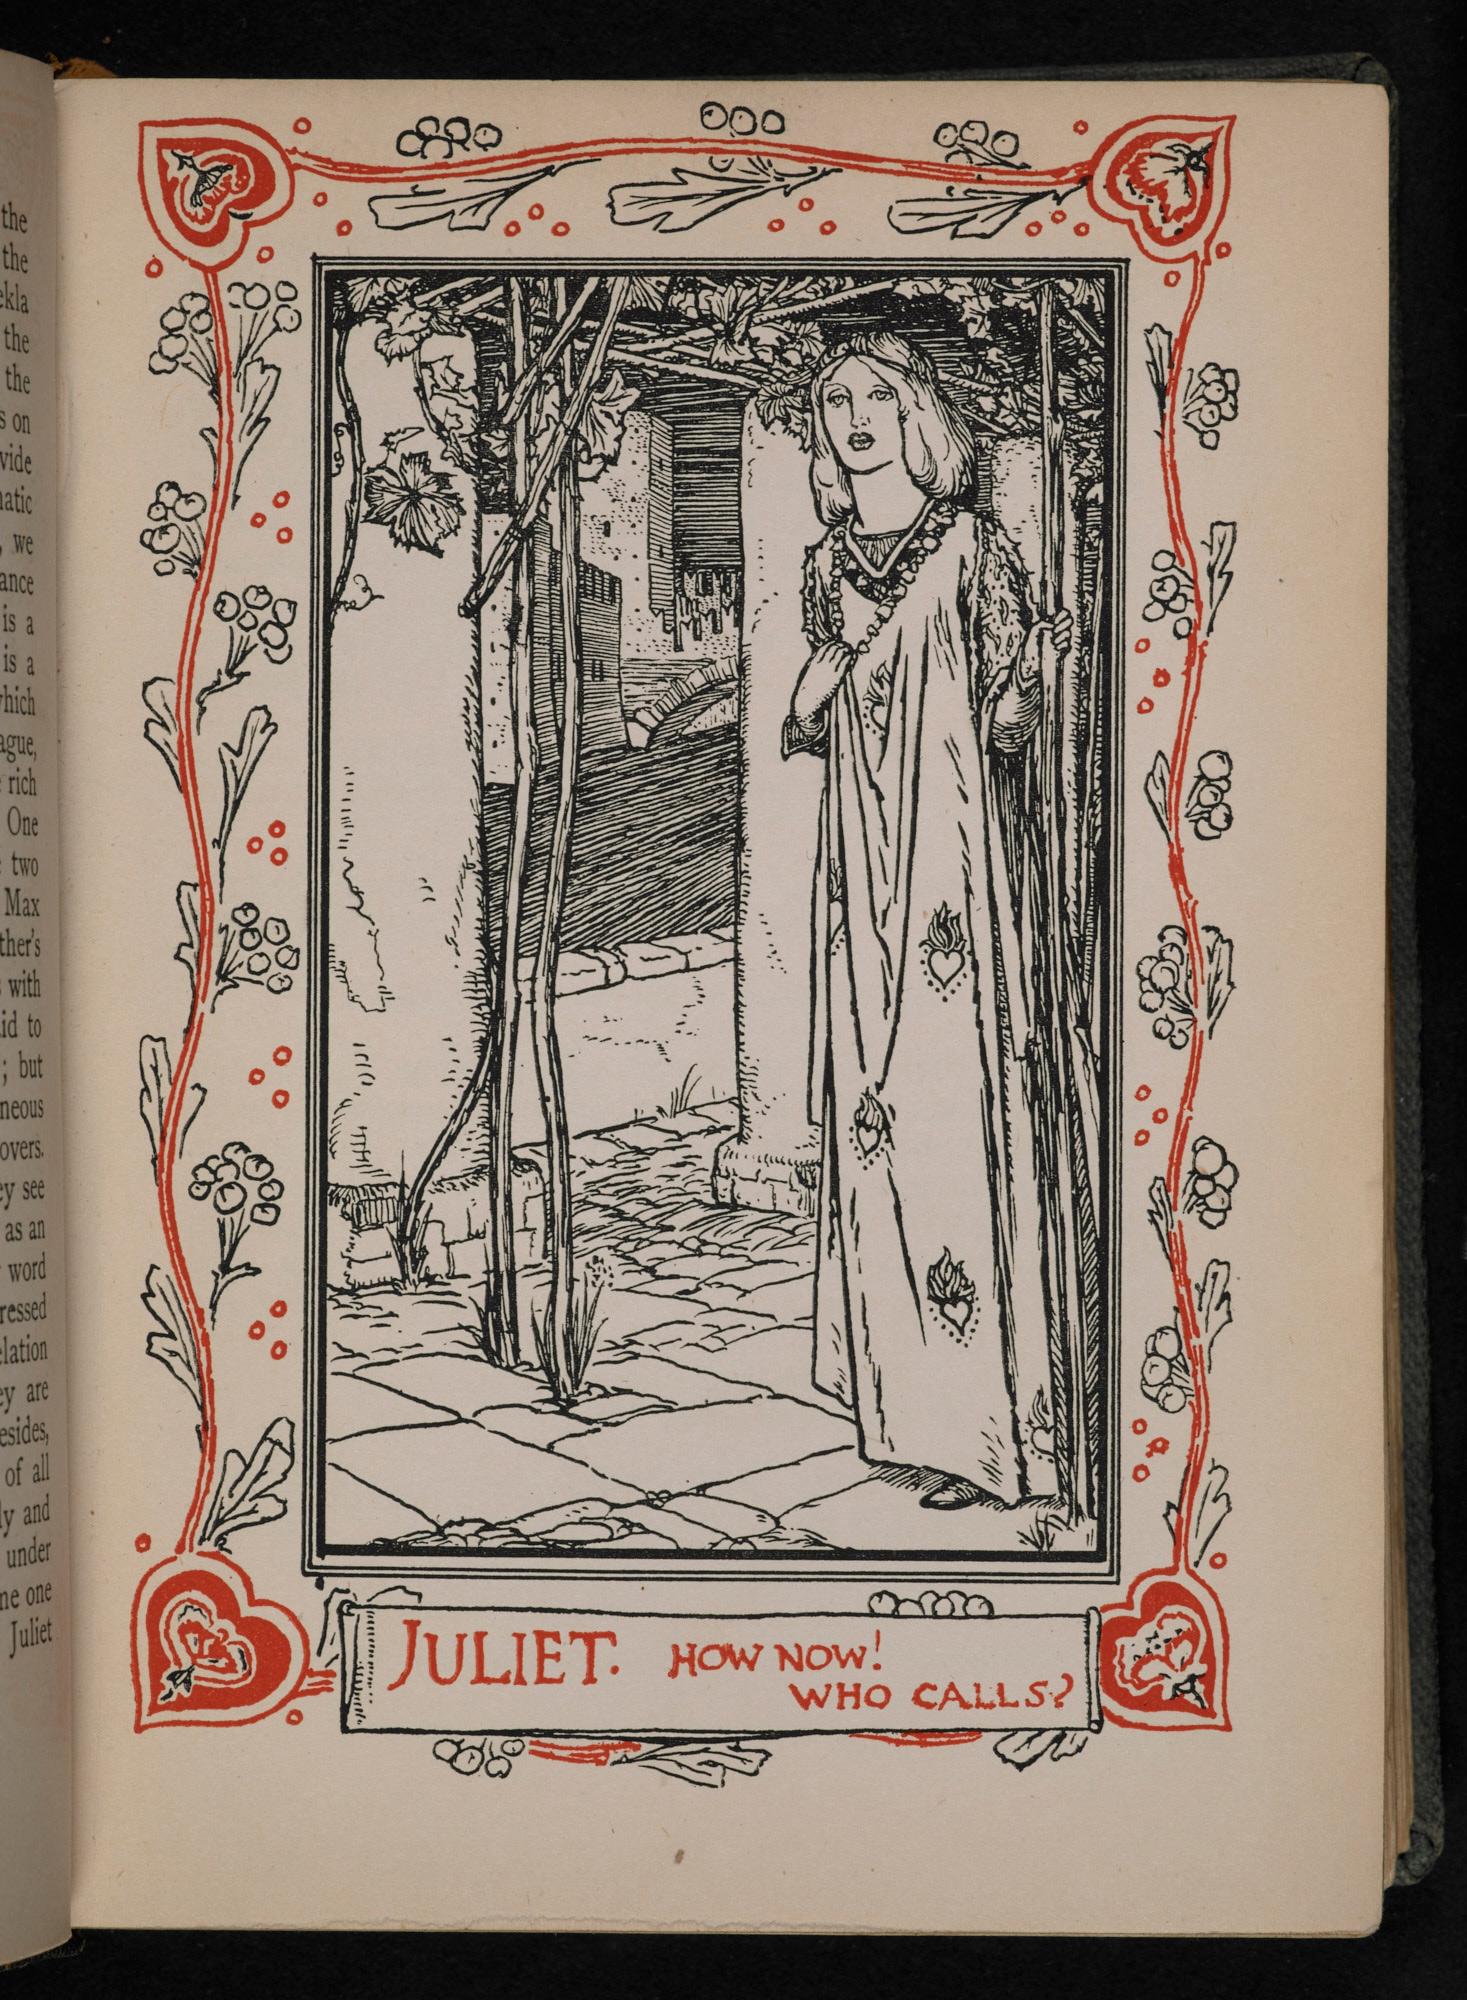 1901 edition of Anna Jameson's Shakespeare's Heroines